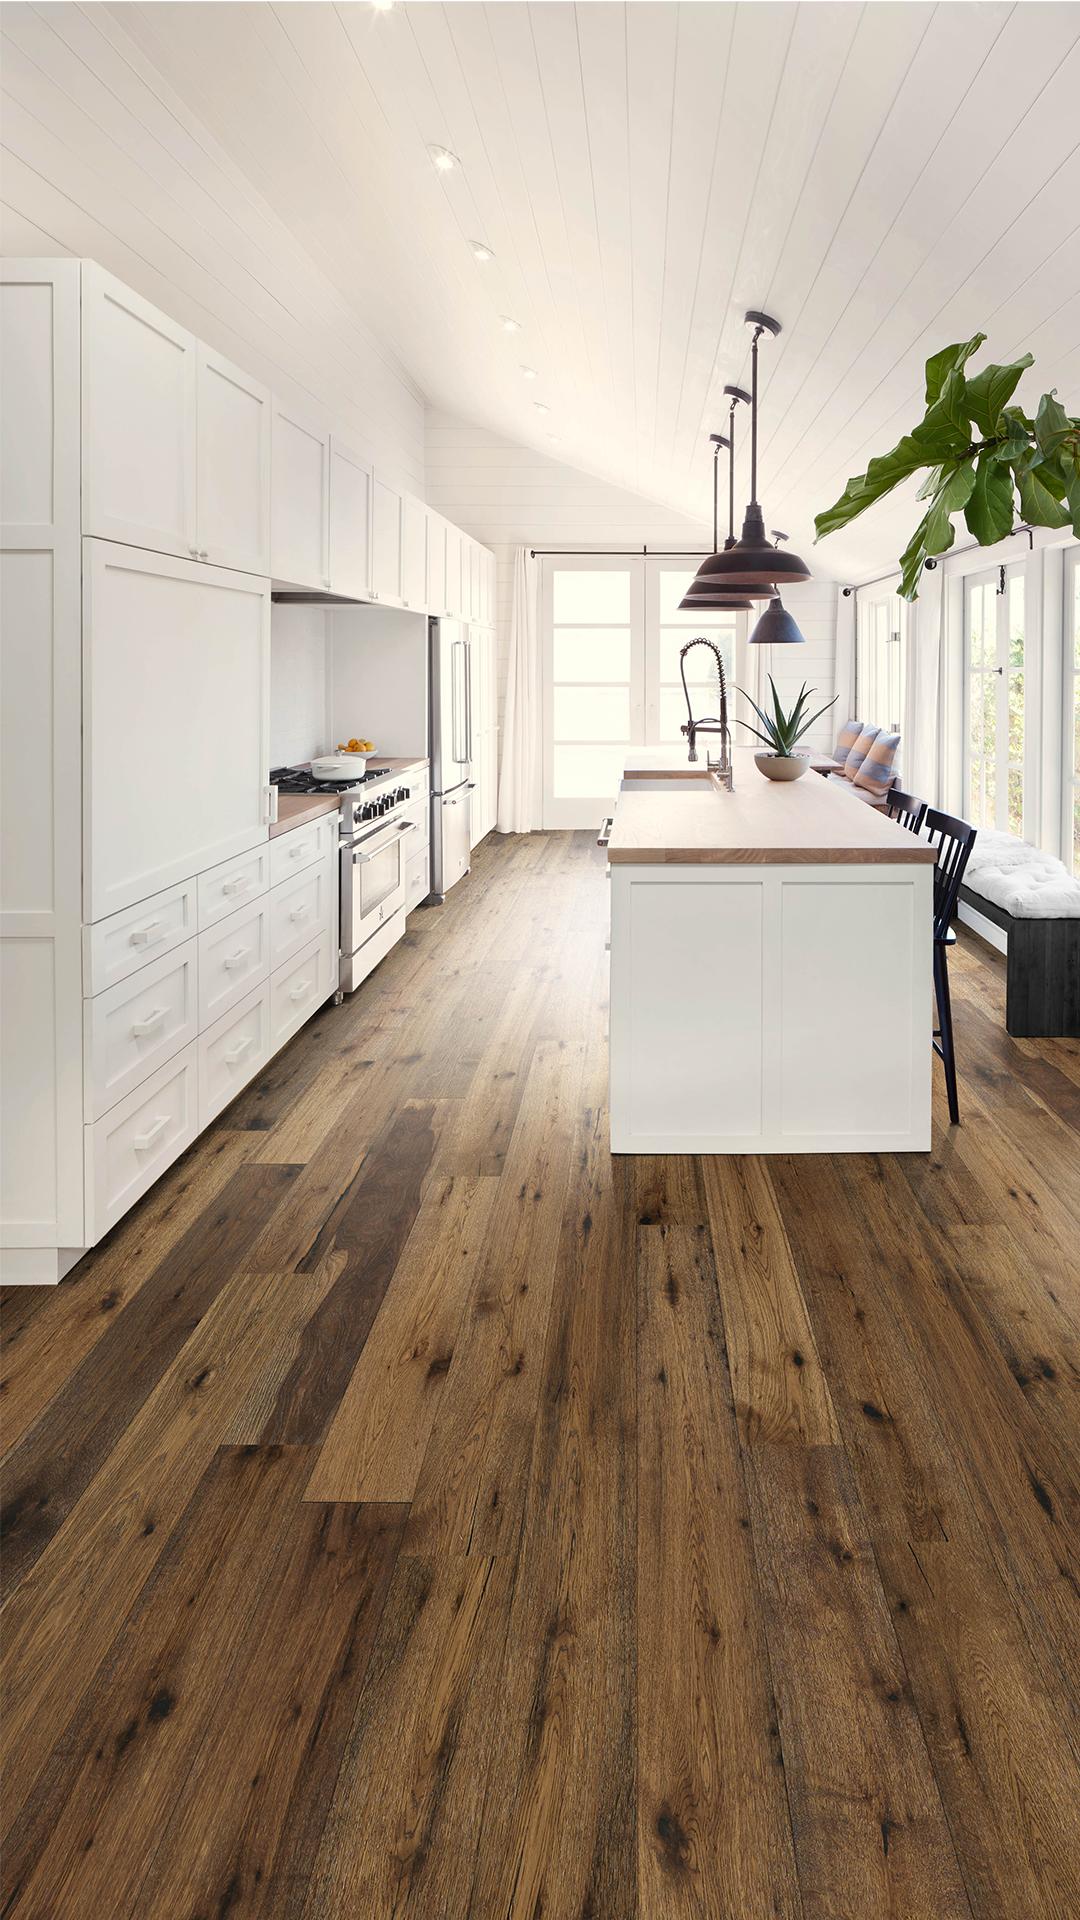 Pin On Kitchens With Hardwood Floors